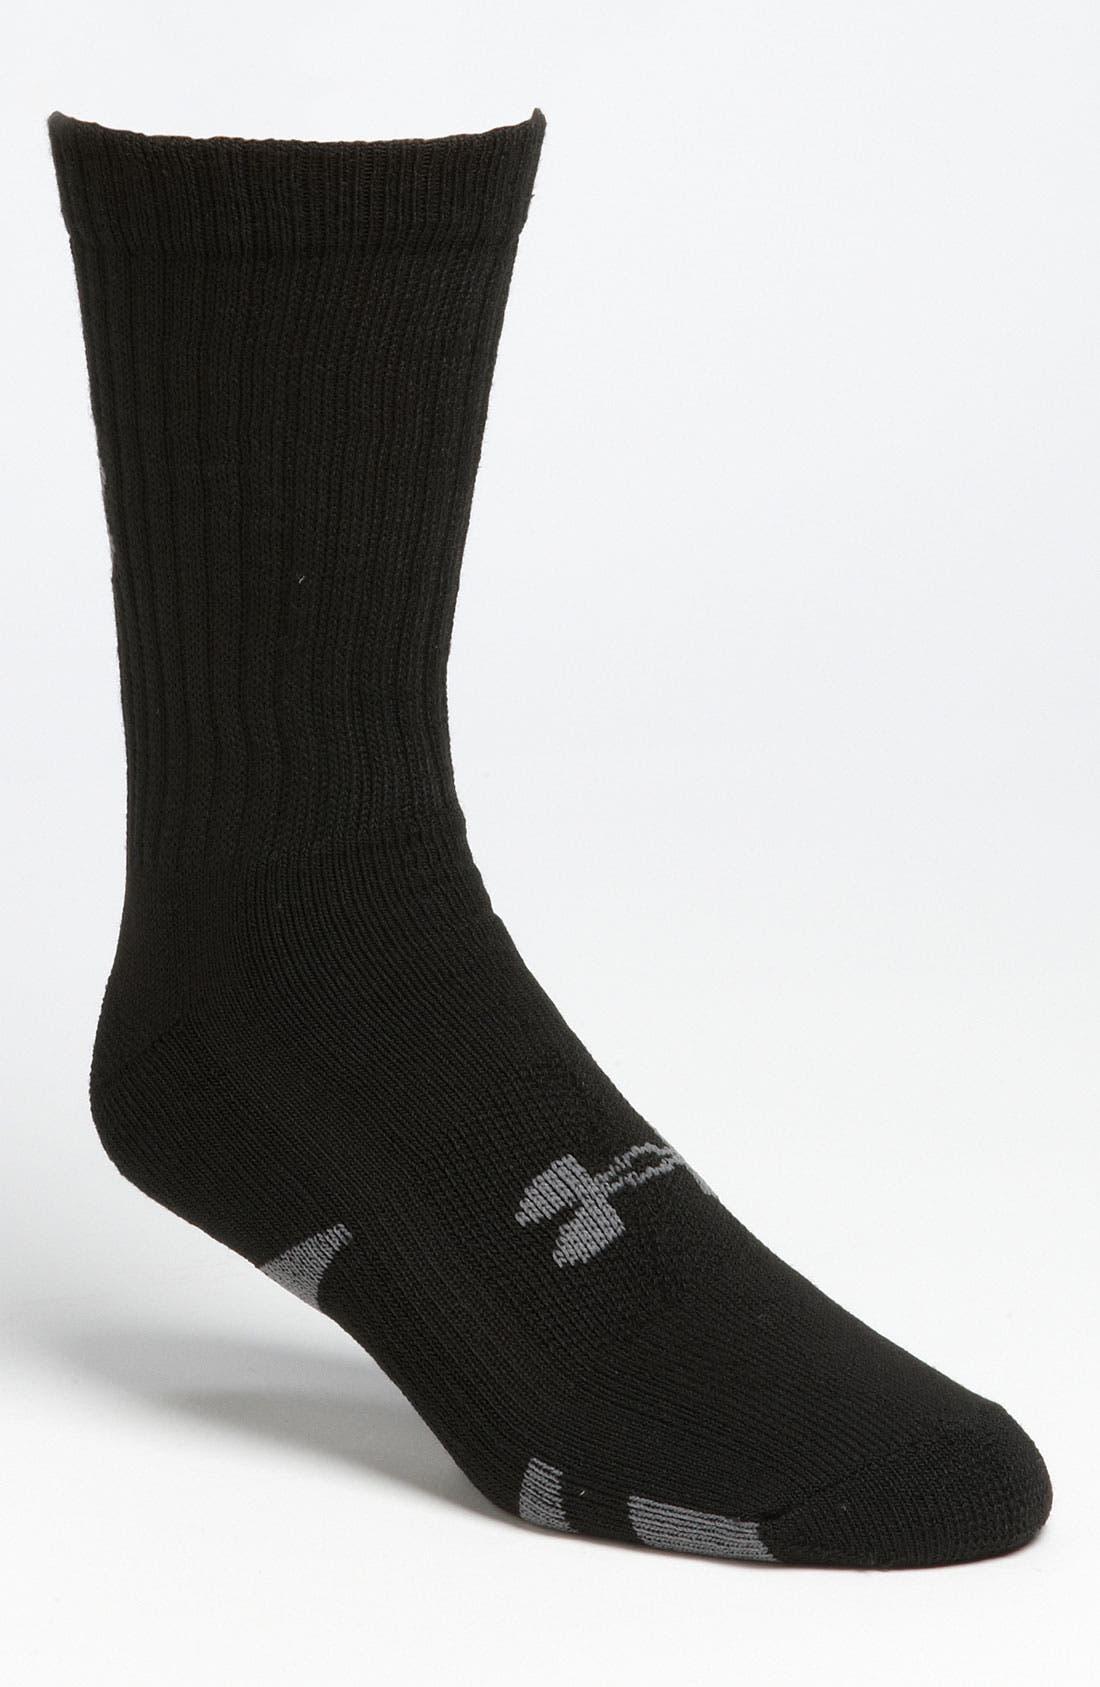 Main Image - Under Armour HeatGear® Crew Socks (4-Pack)